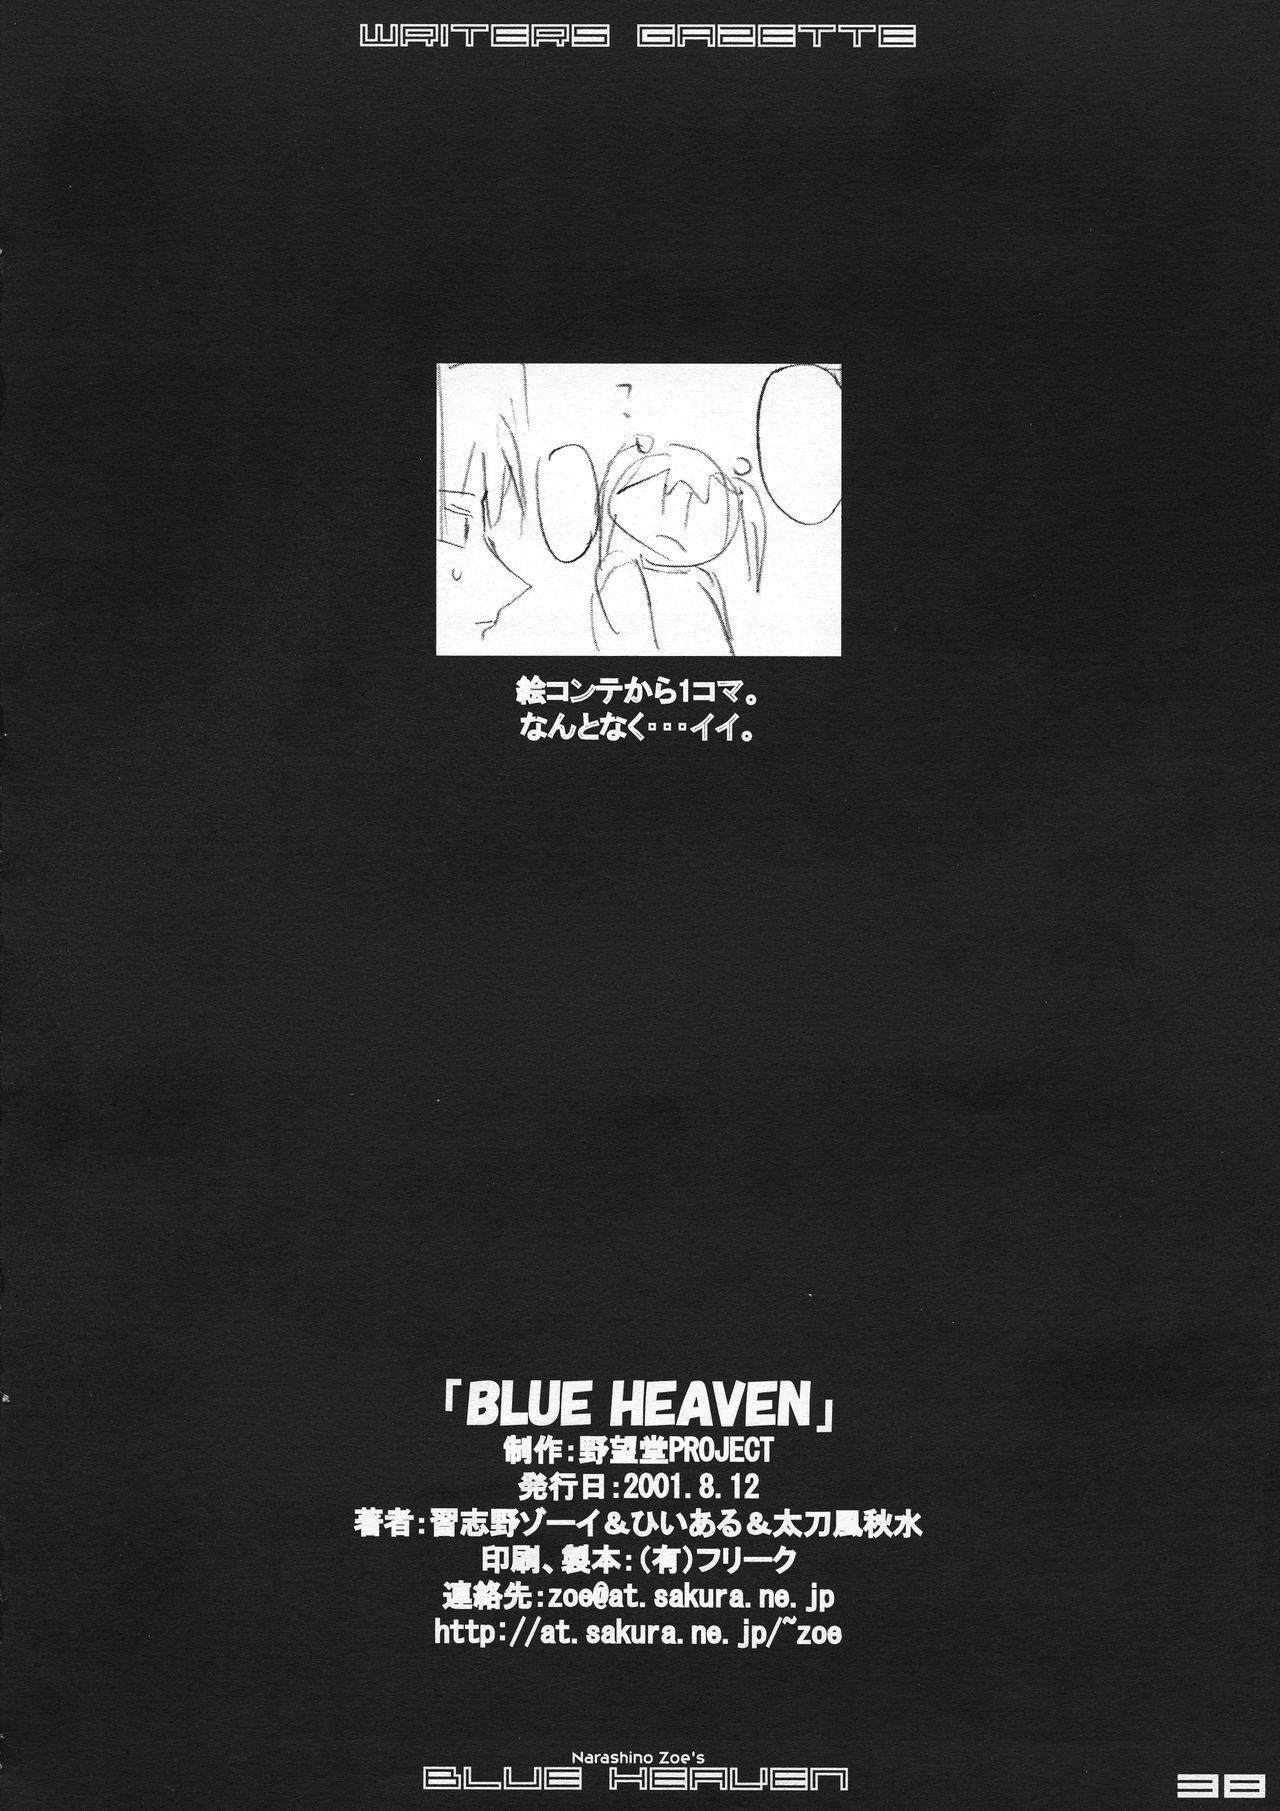 BLUE HEAVEN 36